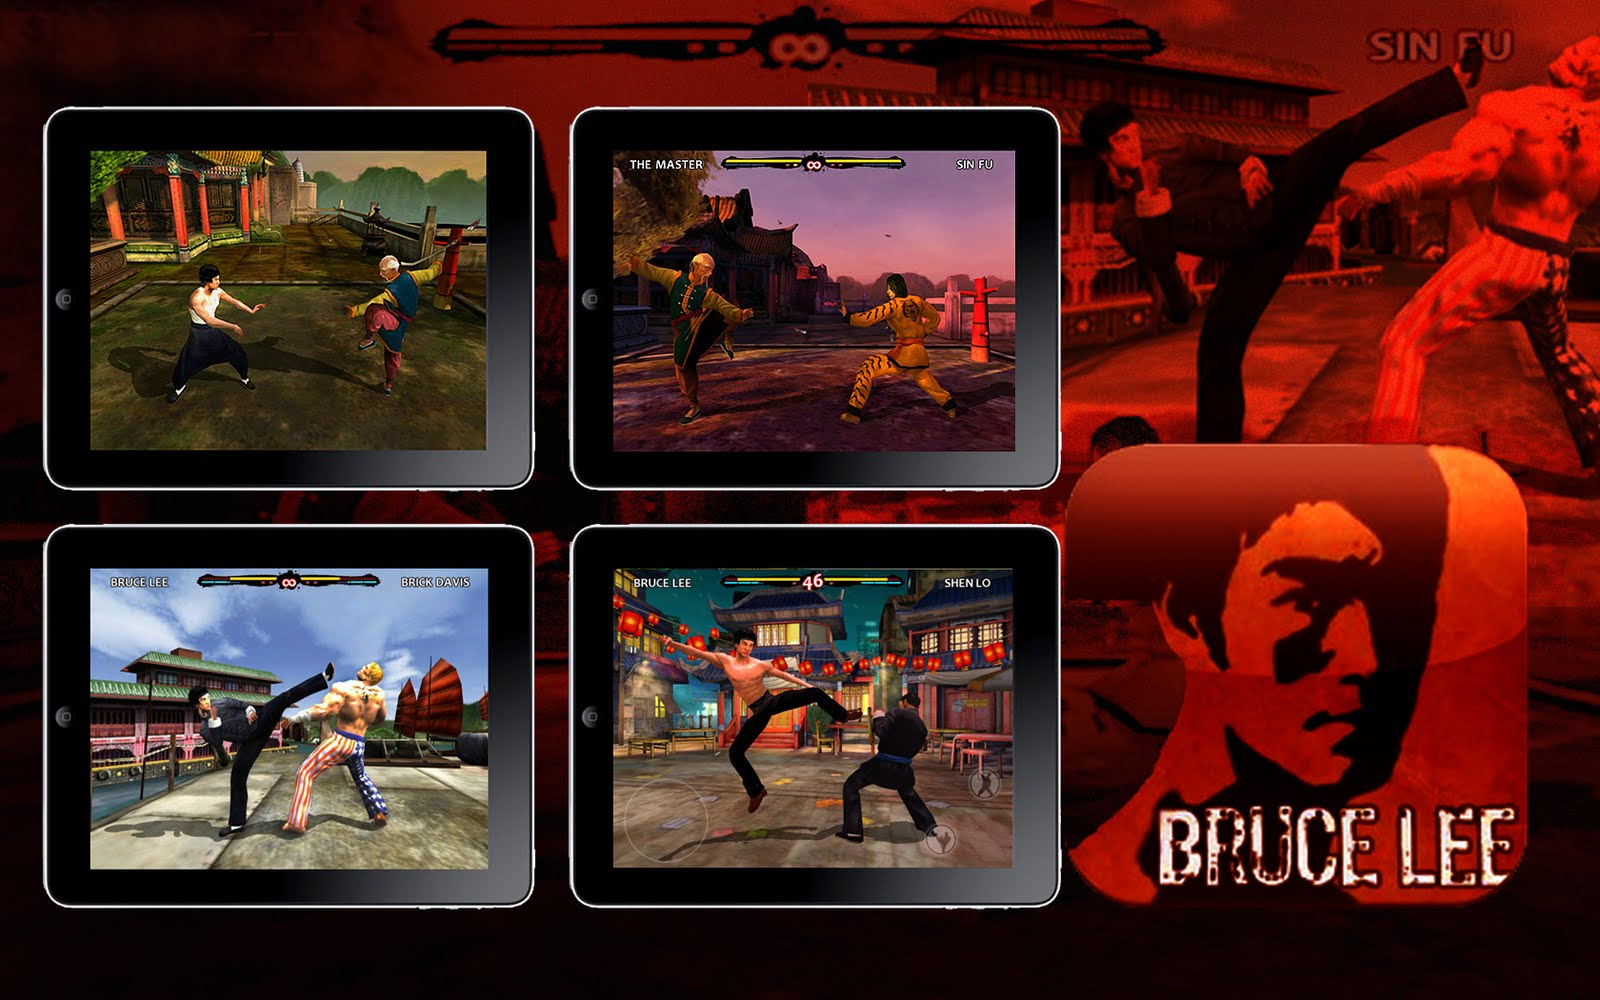 Bruce Lee Dragon Warrior v1.15.26 [APK+DATA] ( ARMV6 trên Android nhé )